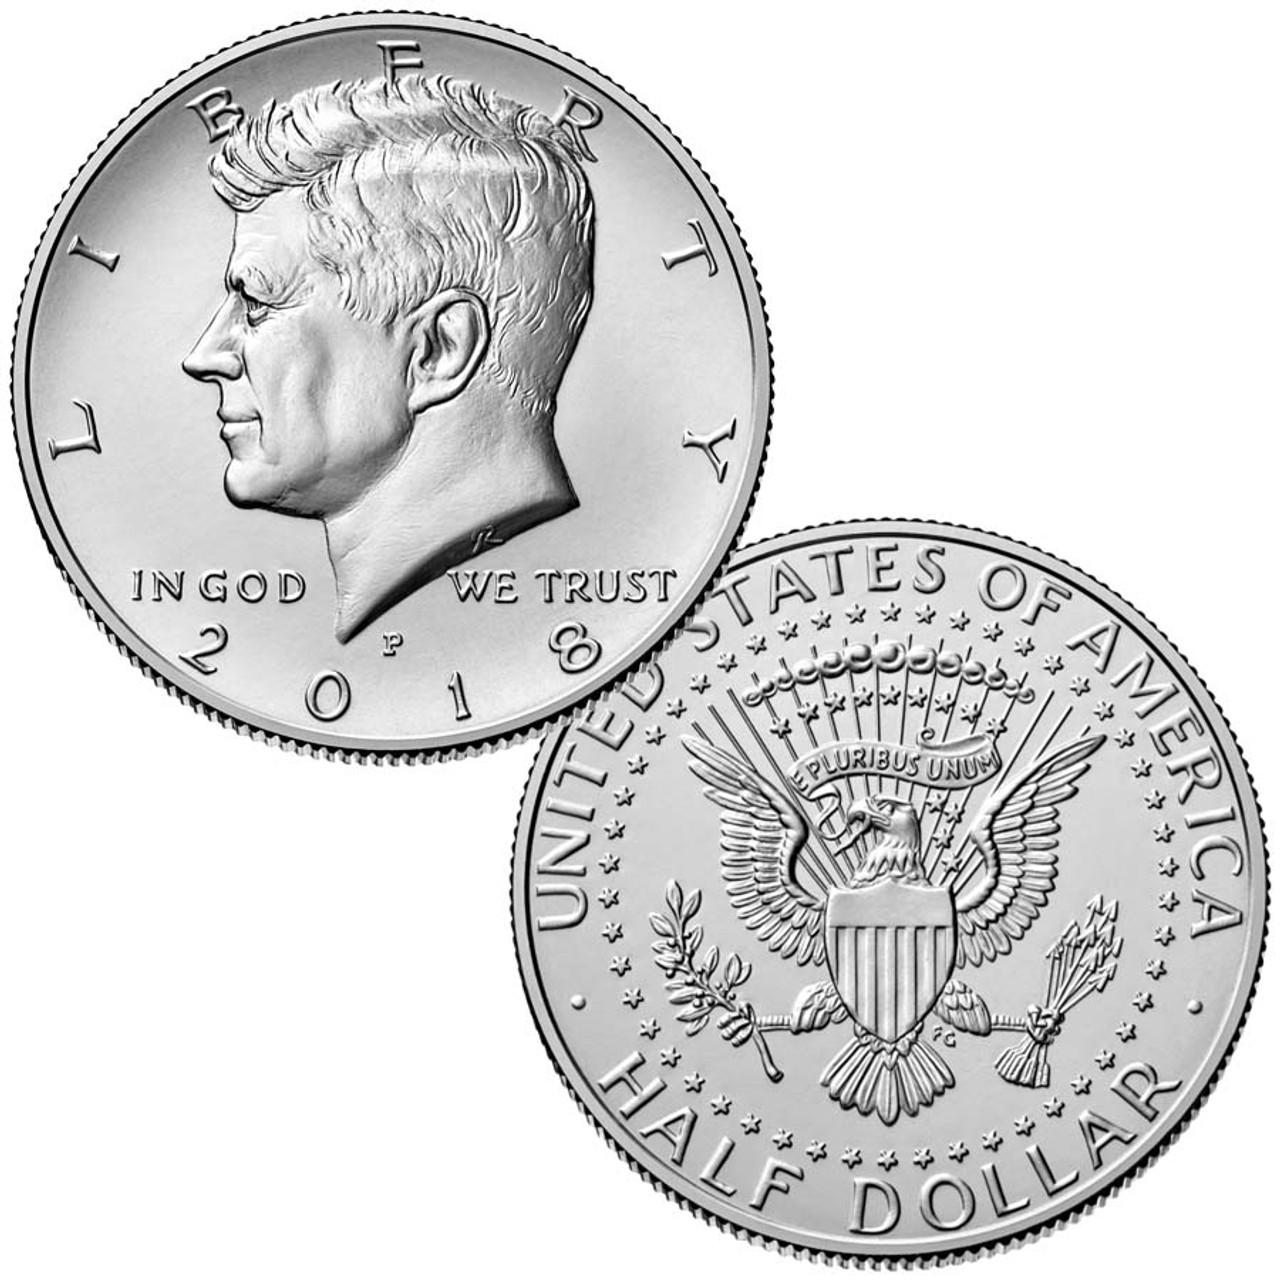 2018-P Kennedy Half Dollar Brilliant Uncirculated Image 1